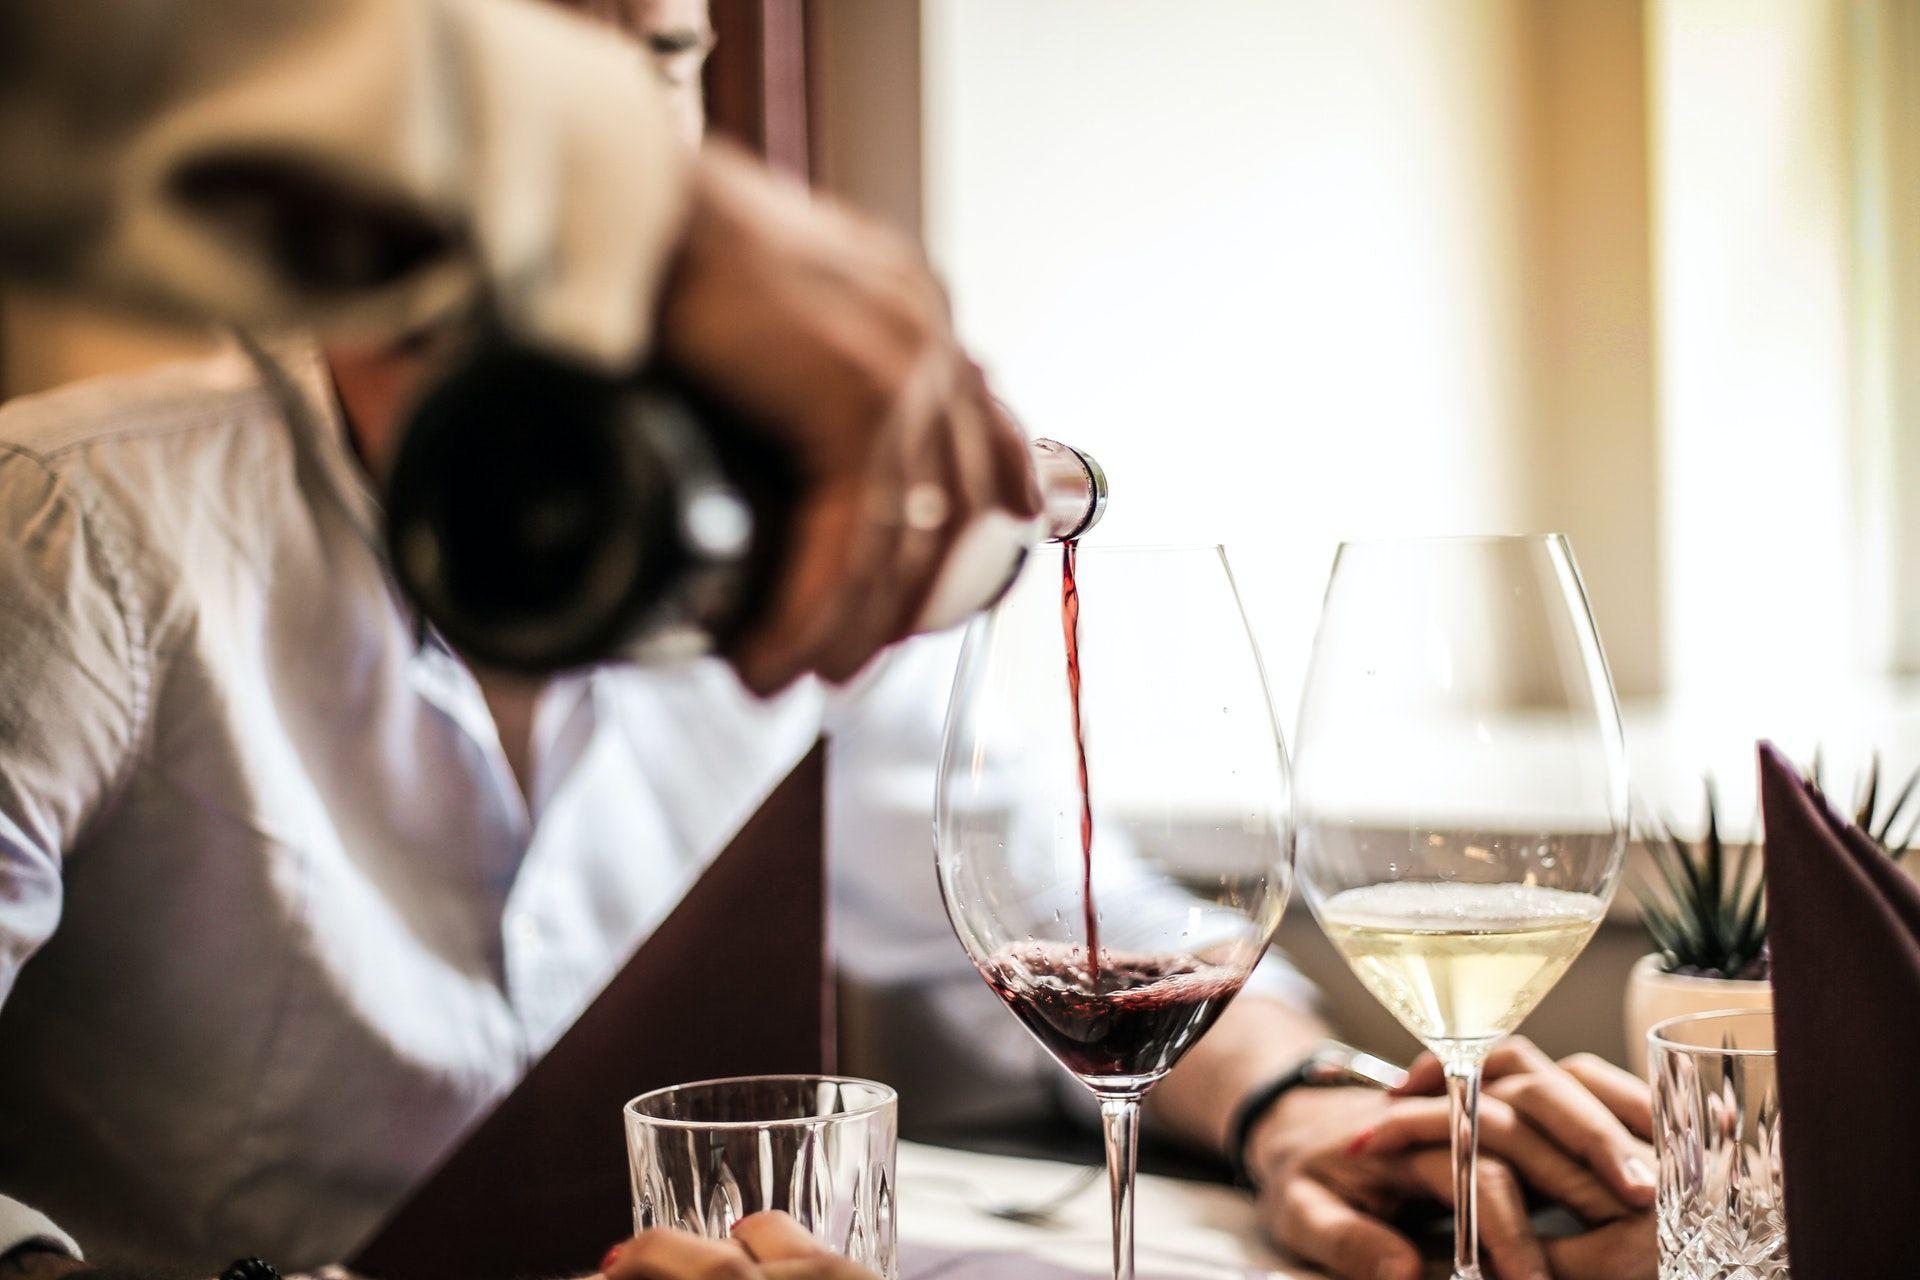 Sommelier pouring wine; WSET Level 3 exam